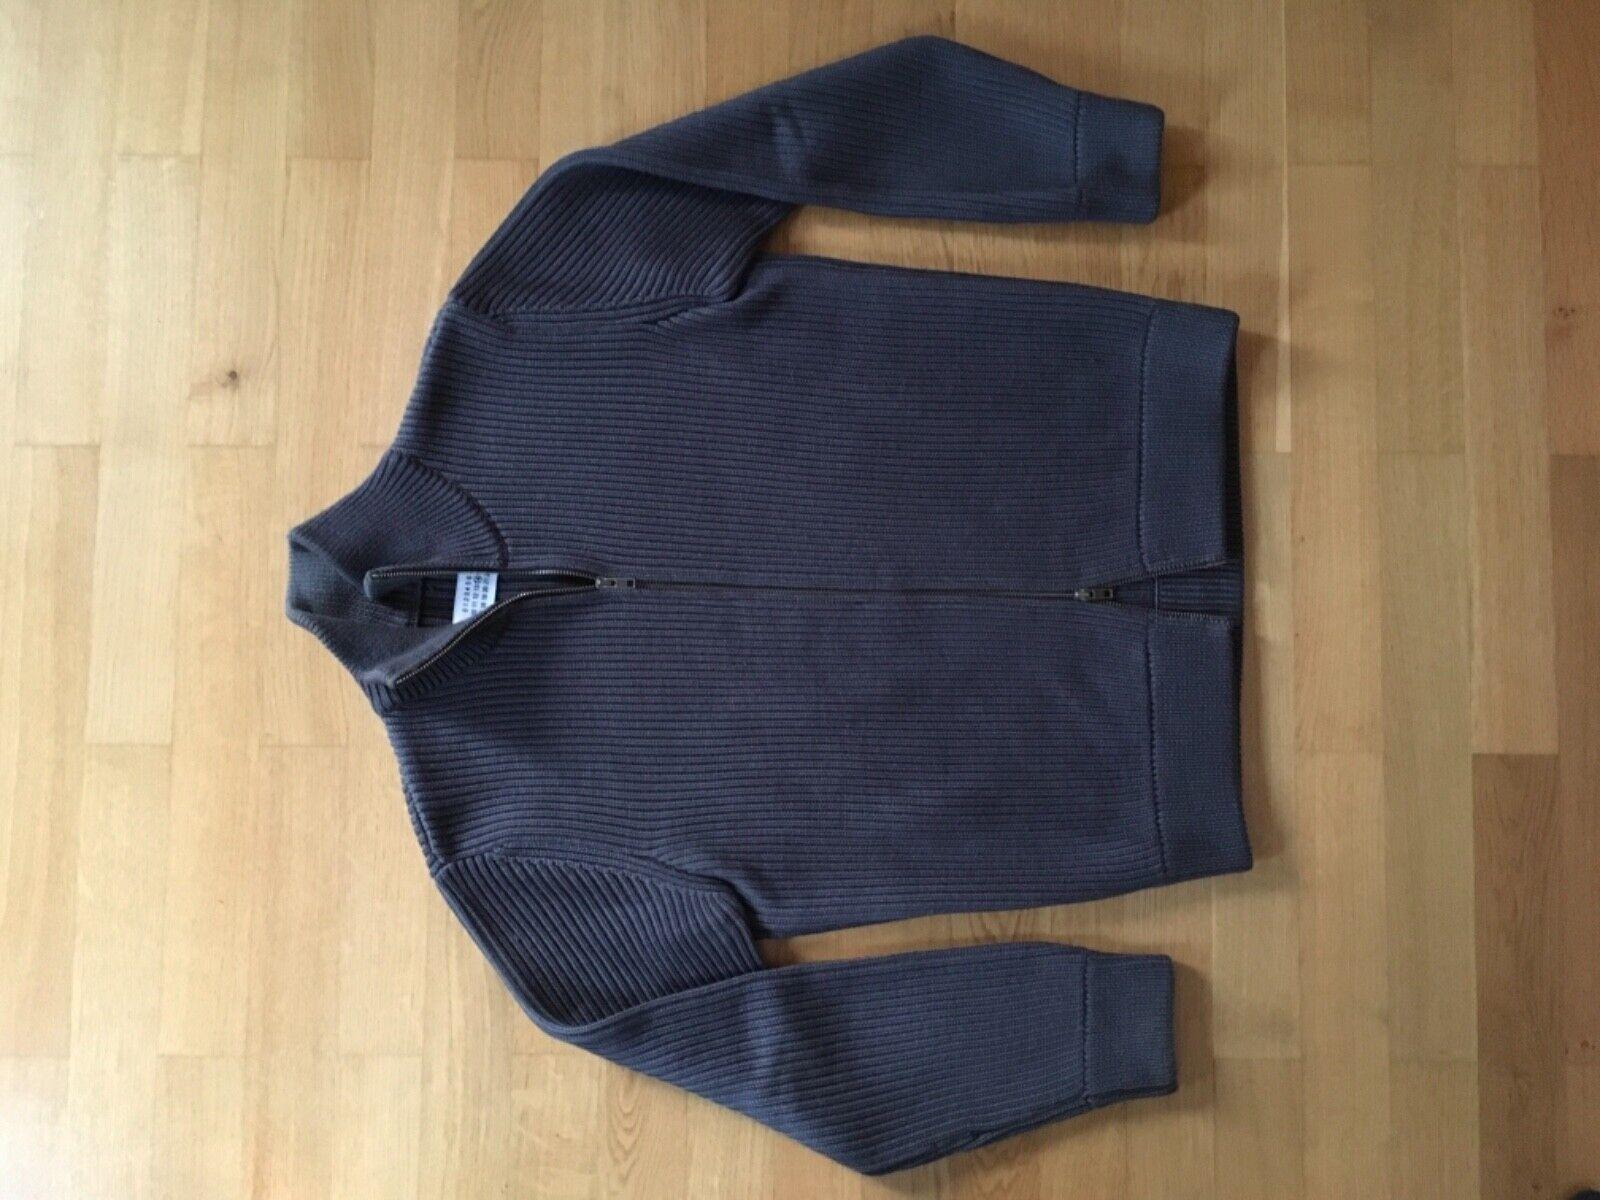 Maison Margiela Herren Strickjacke Farbe Grau Gr L sehr gepflegt